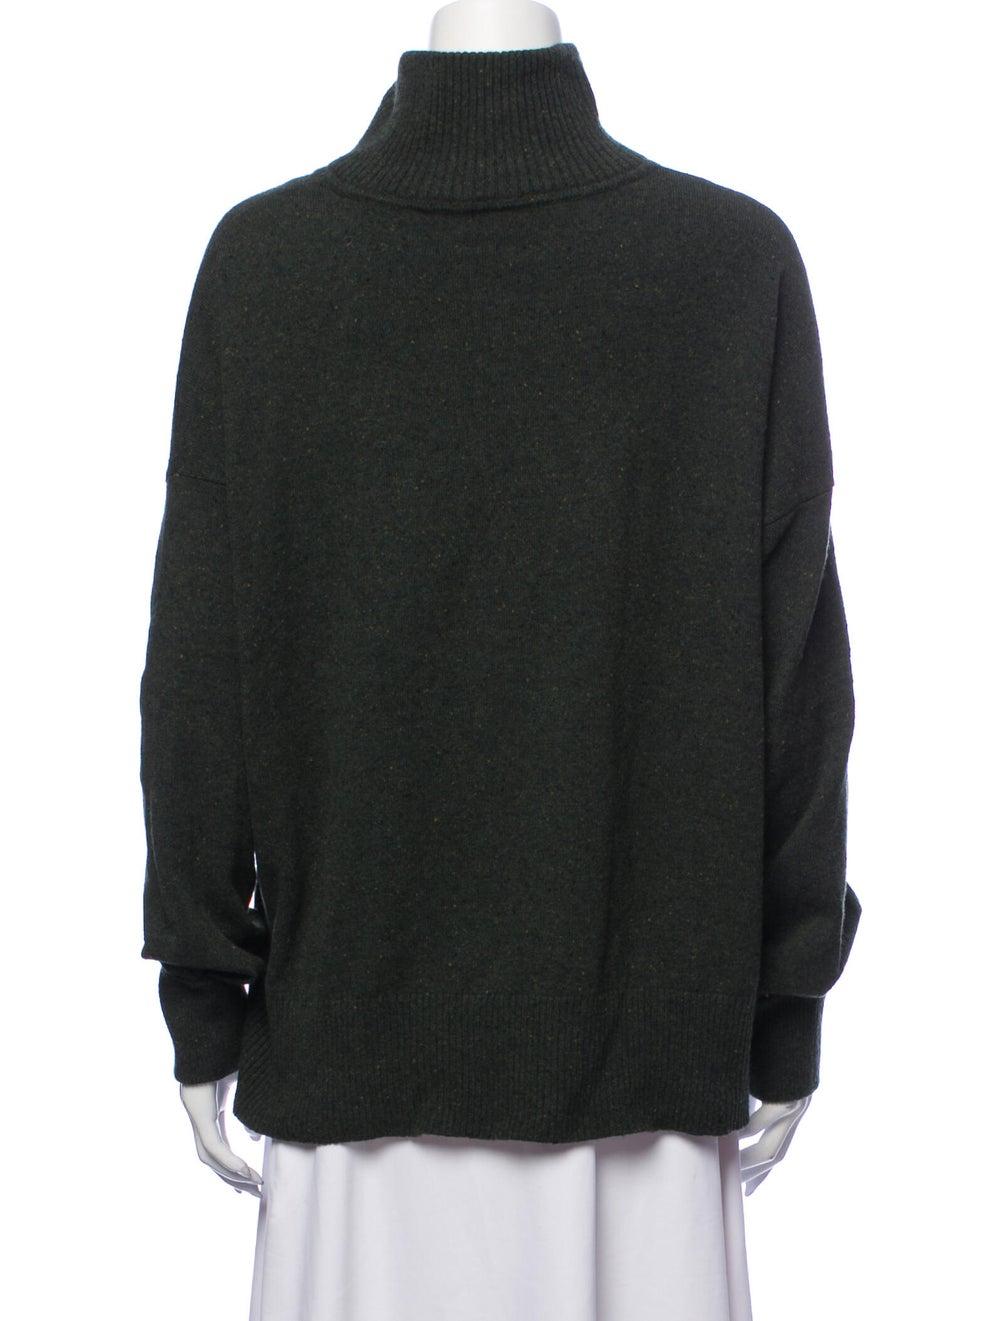 Autumn Cashmere Cashmere Turtleneck Sweater Green - image 3